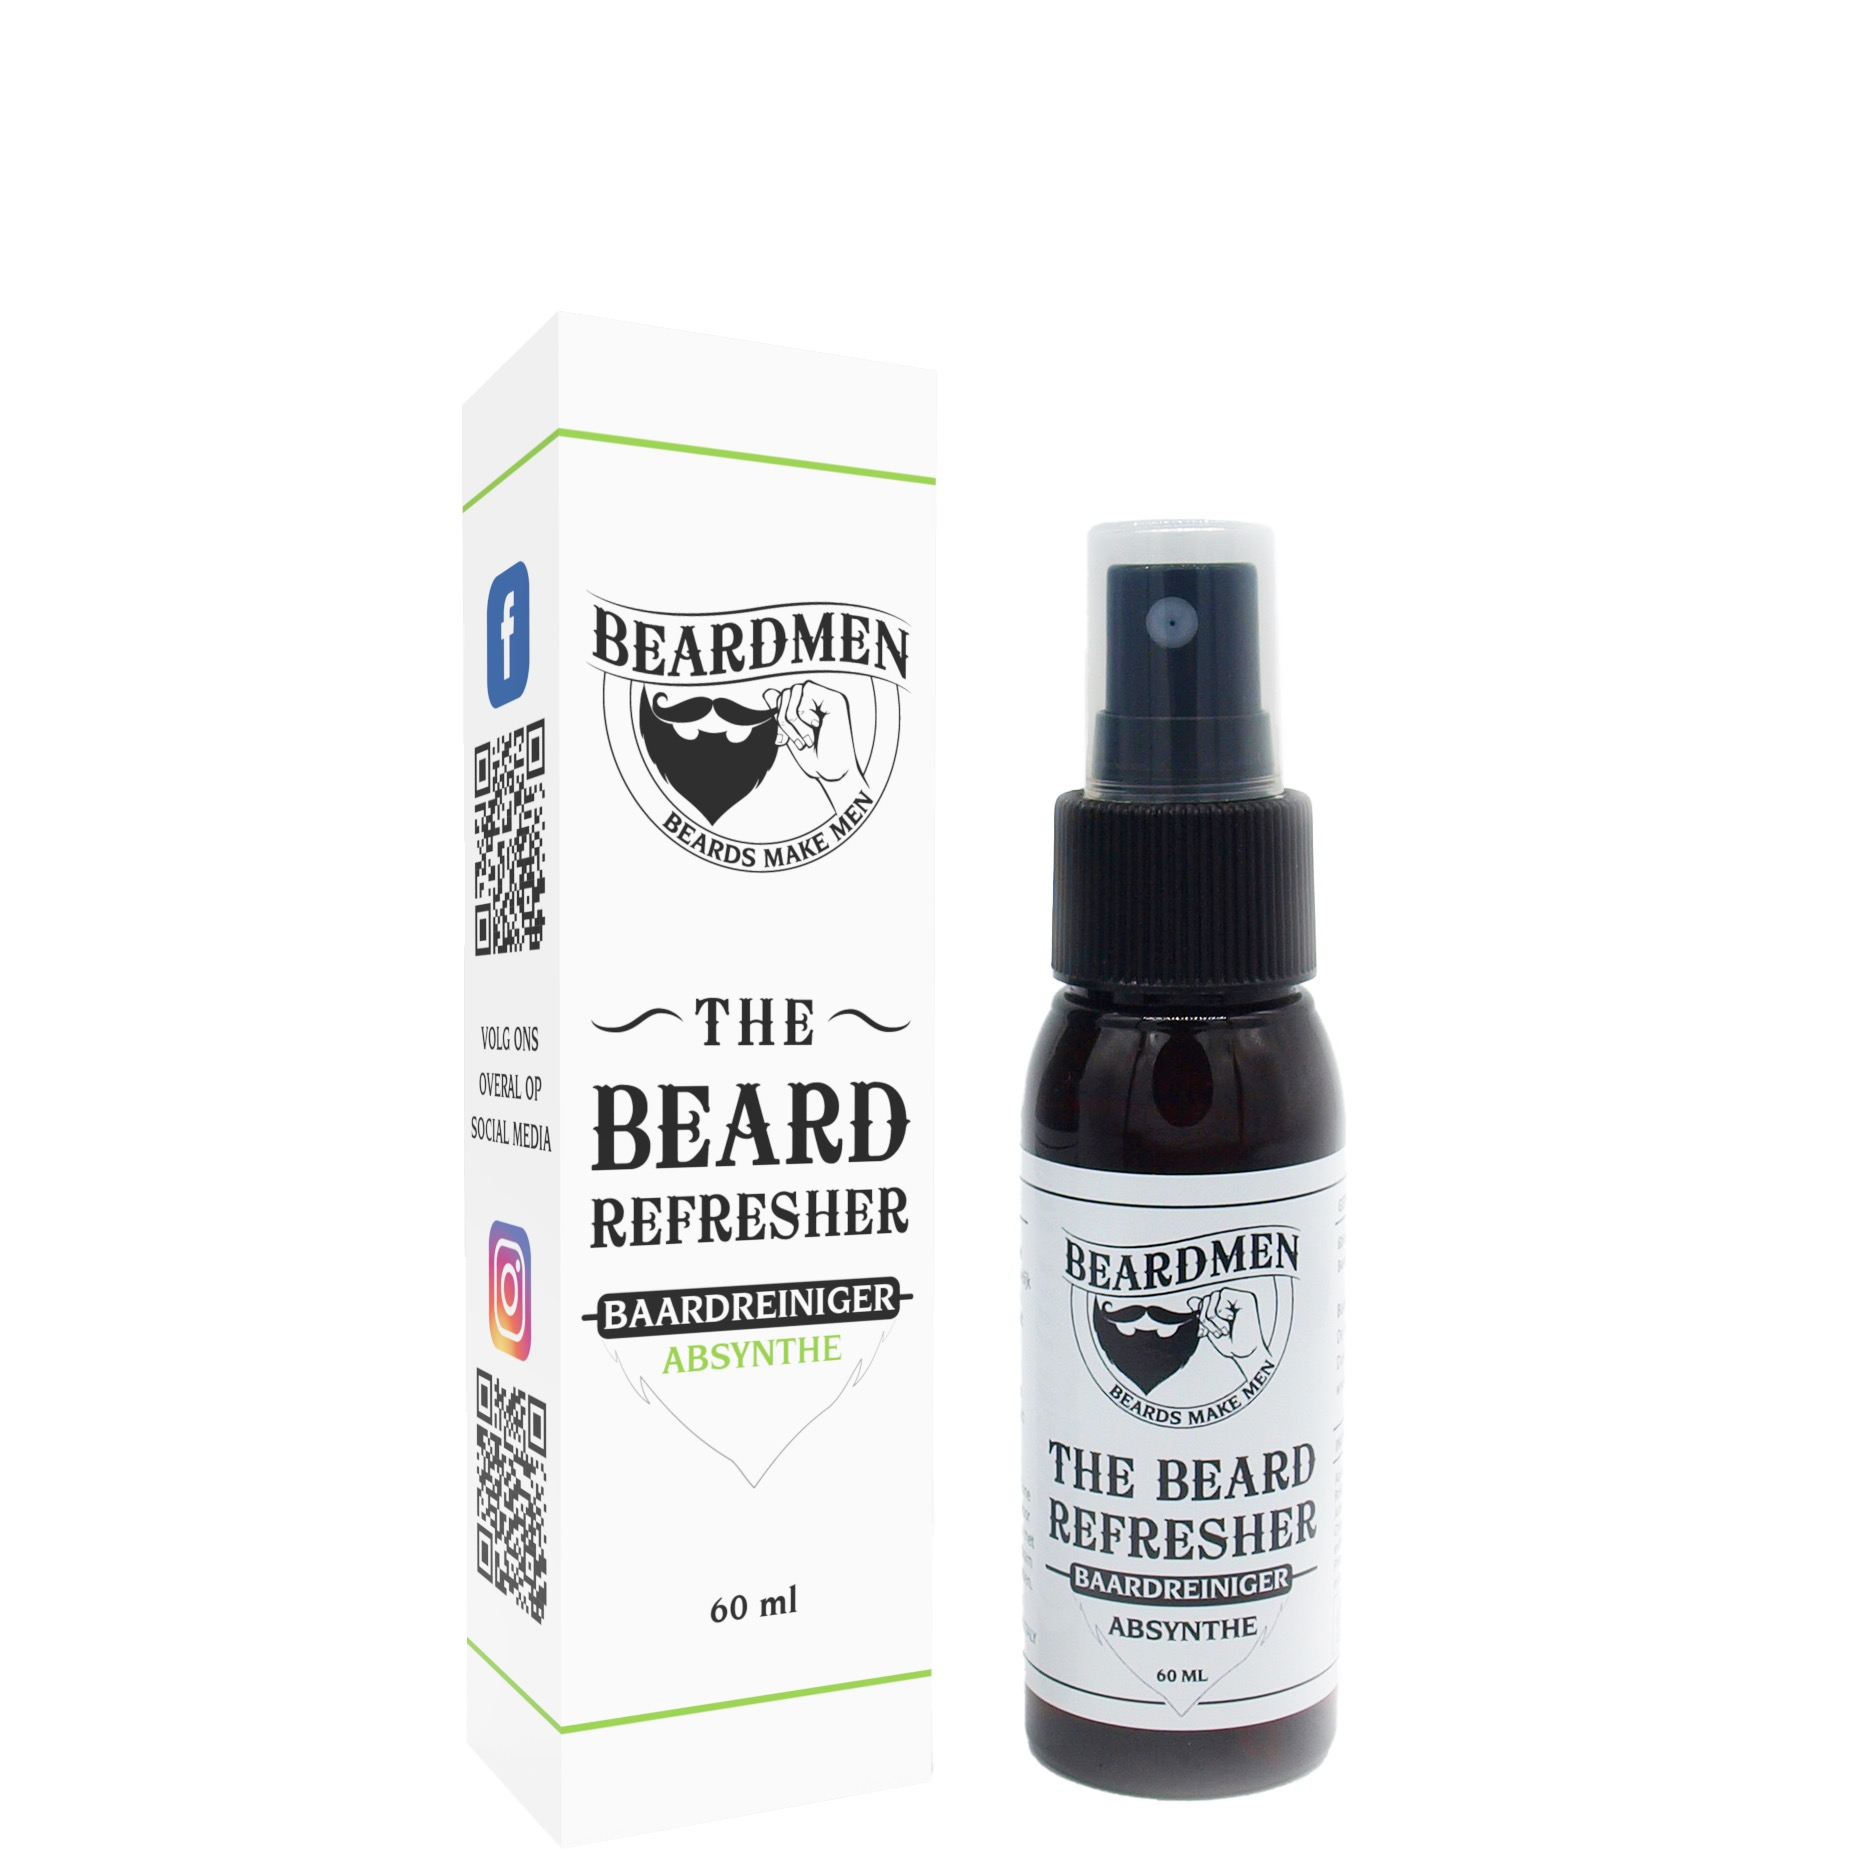 Beardmen Baardreiniger Absynthe